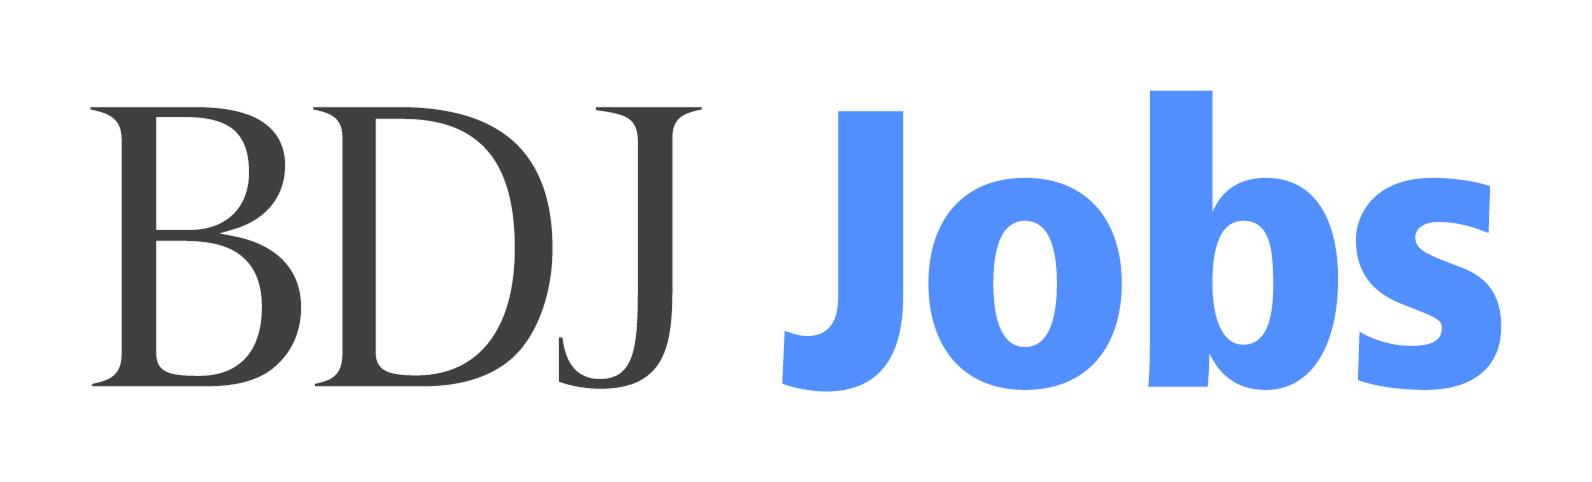 British Dental Journal (BDJ)